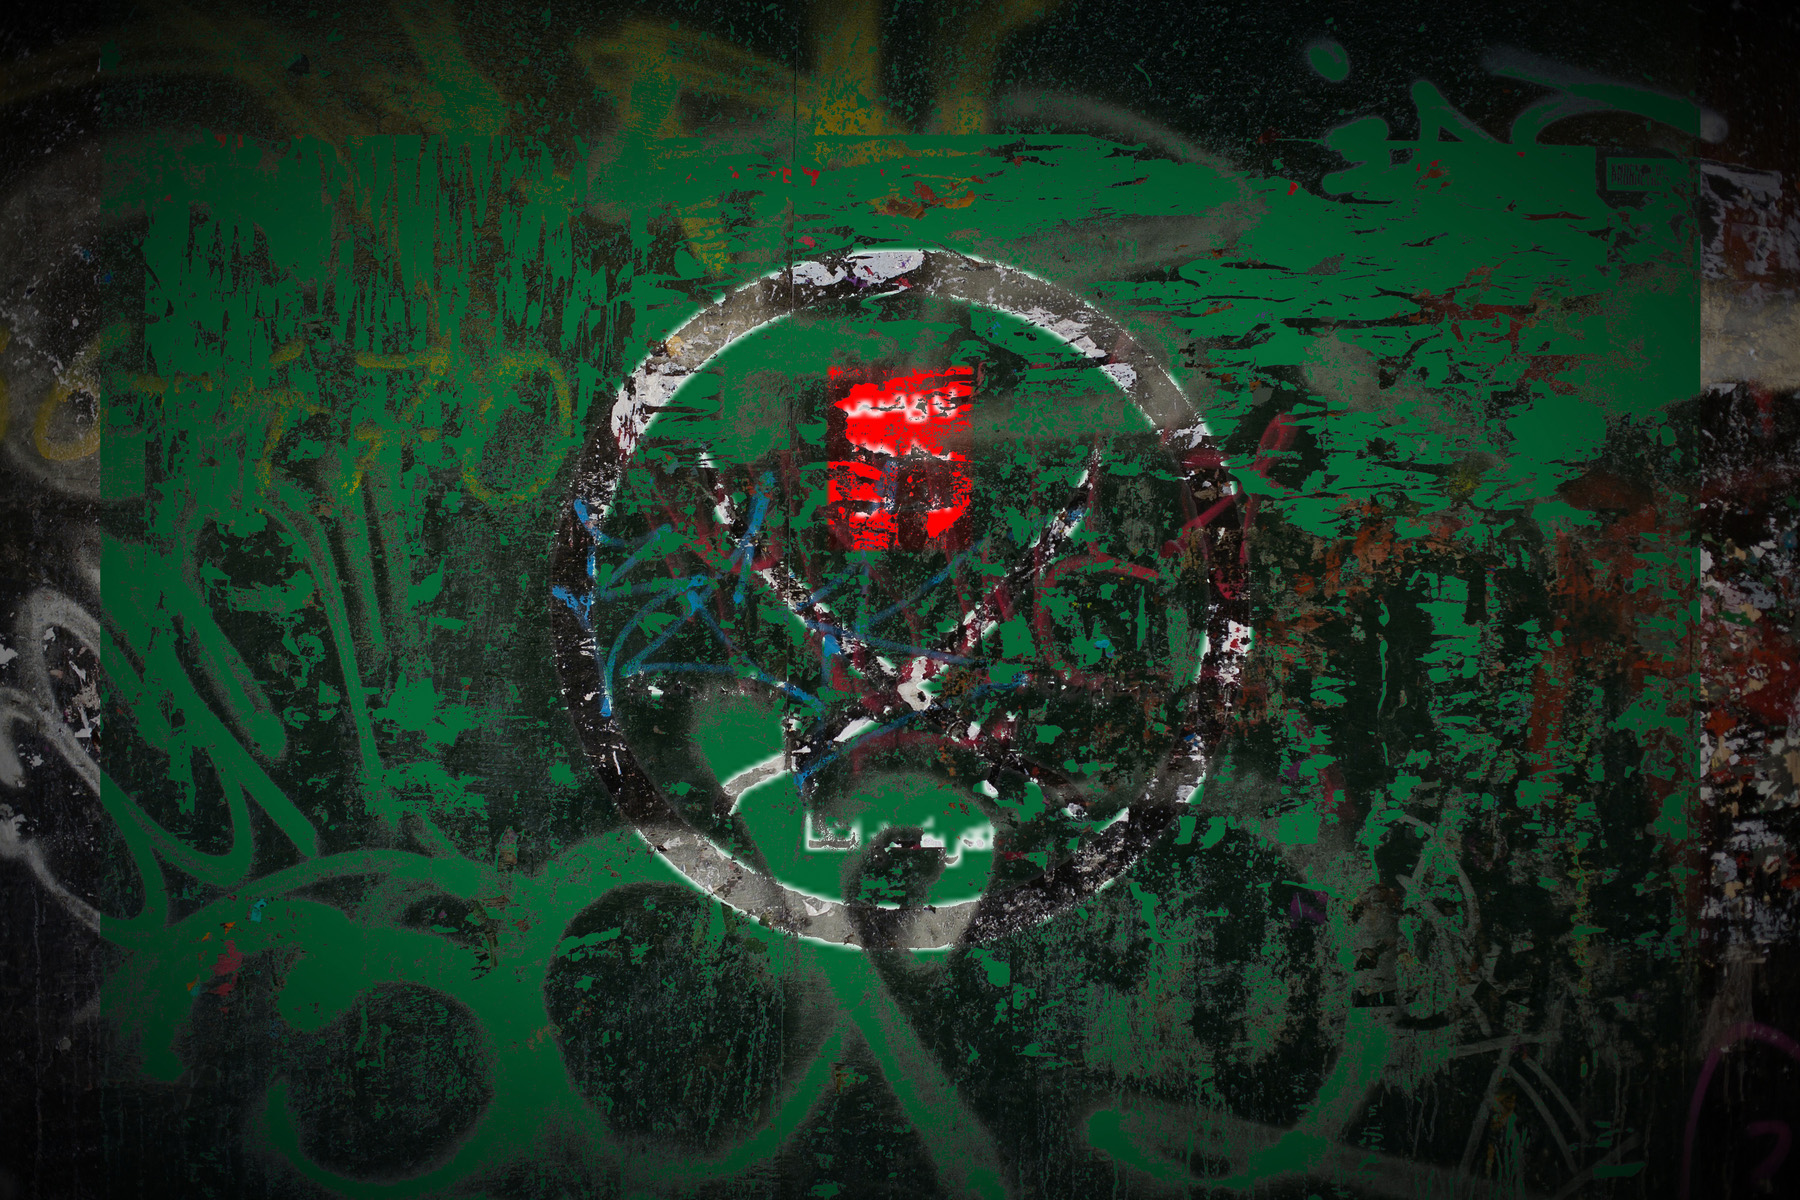 Muslim Brotherhood graffiti